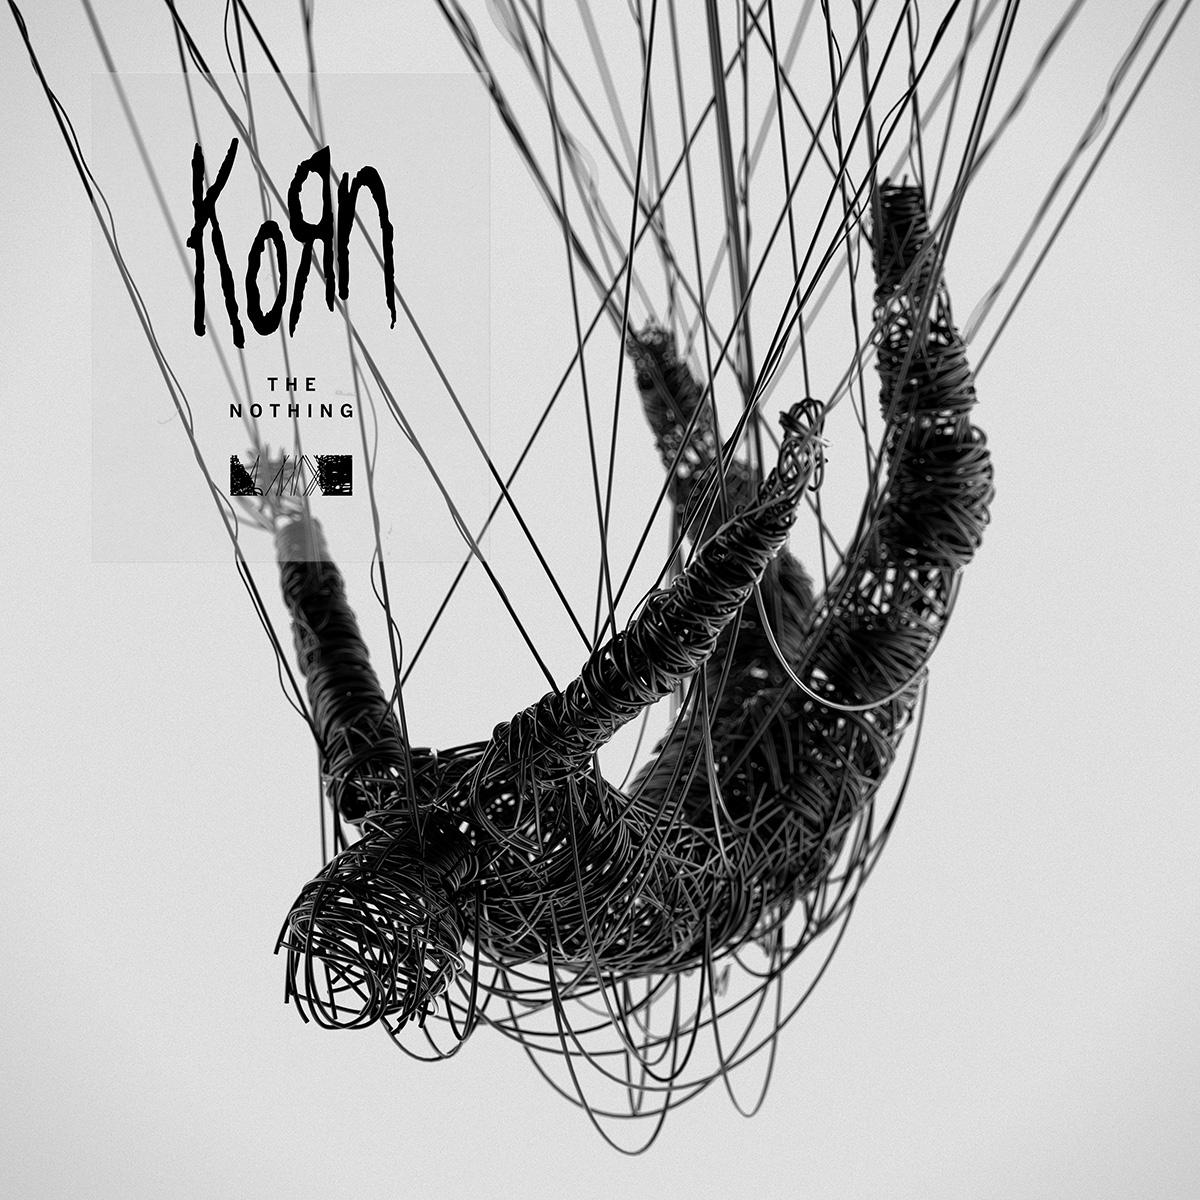 KRN-Nothing-Cover-Final-wSticker-LR